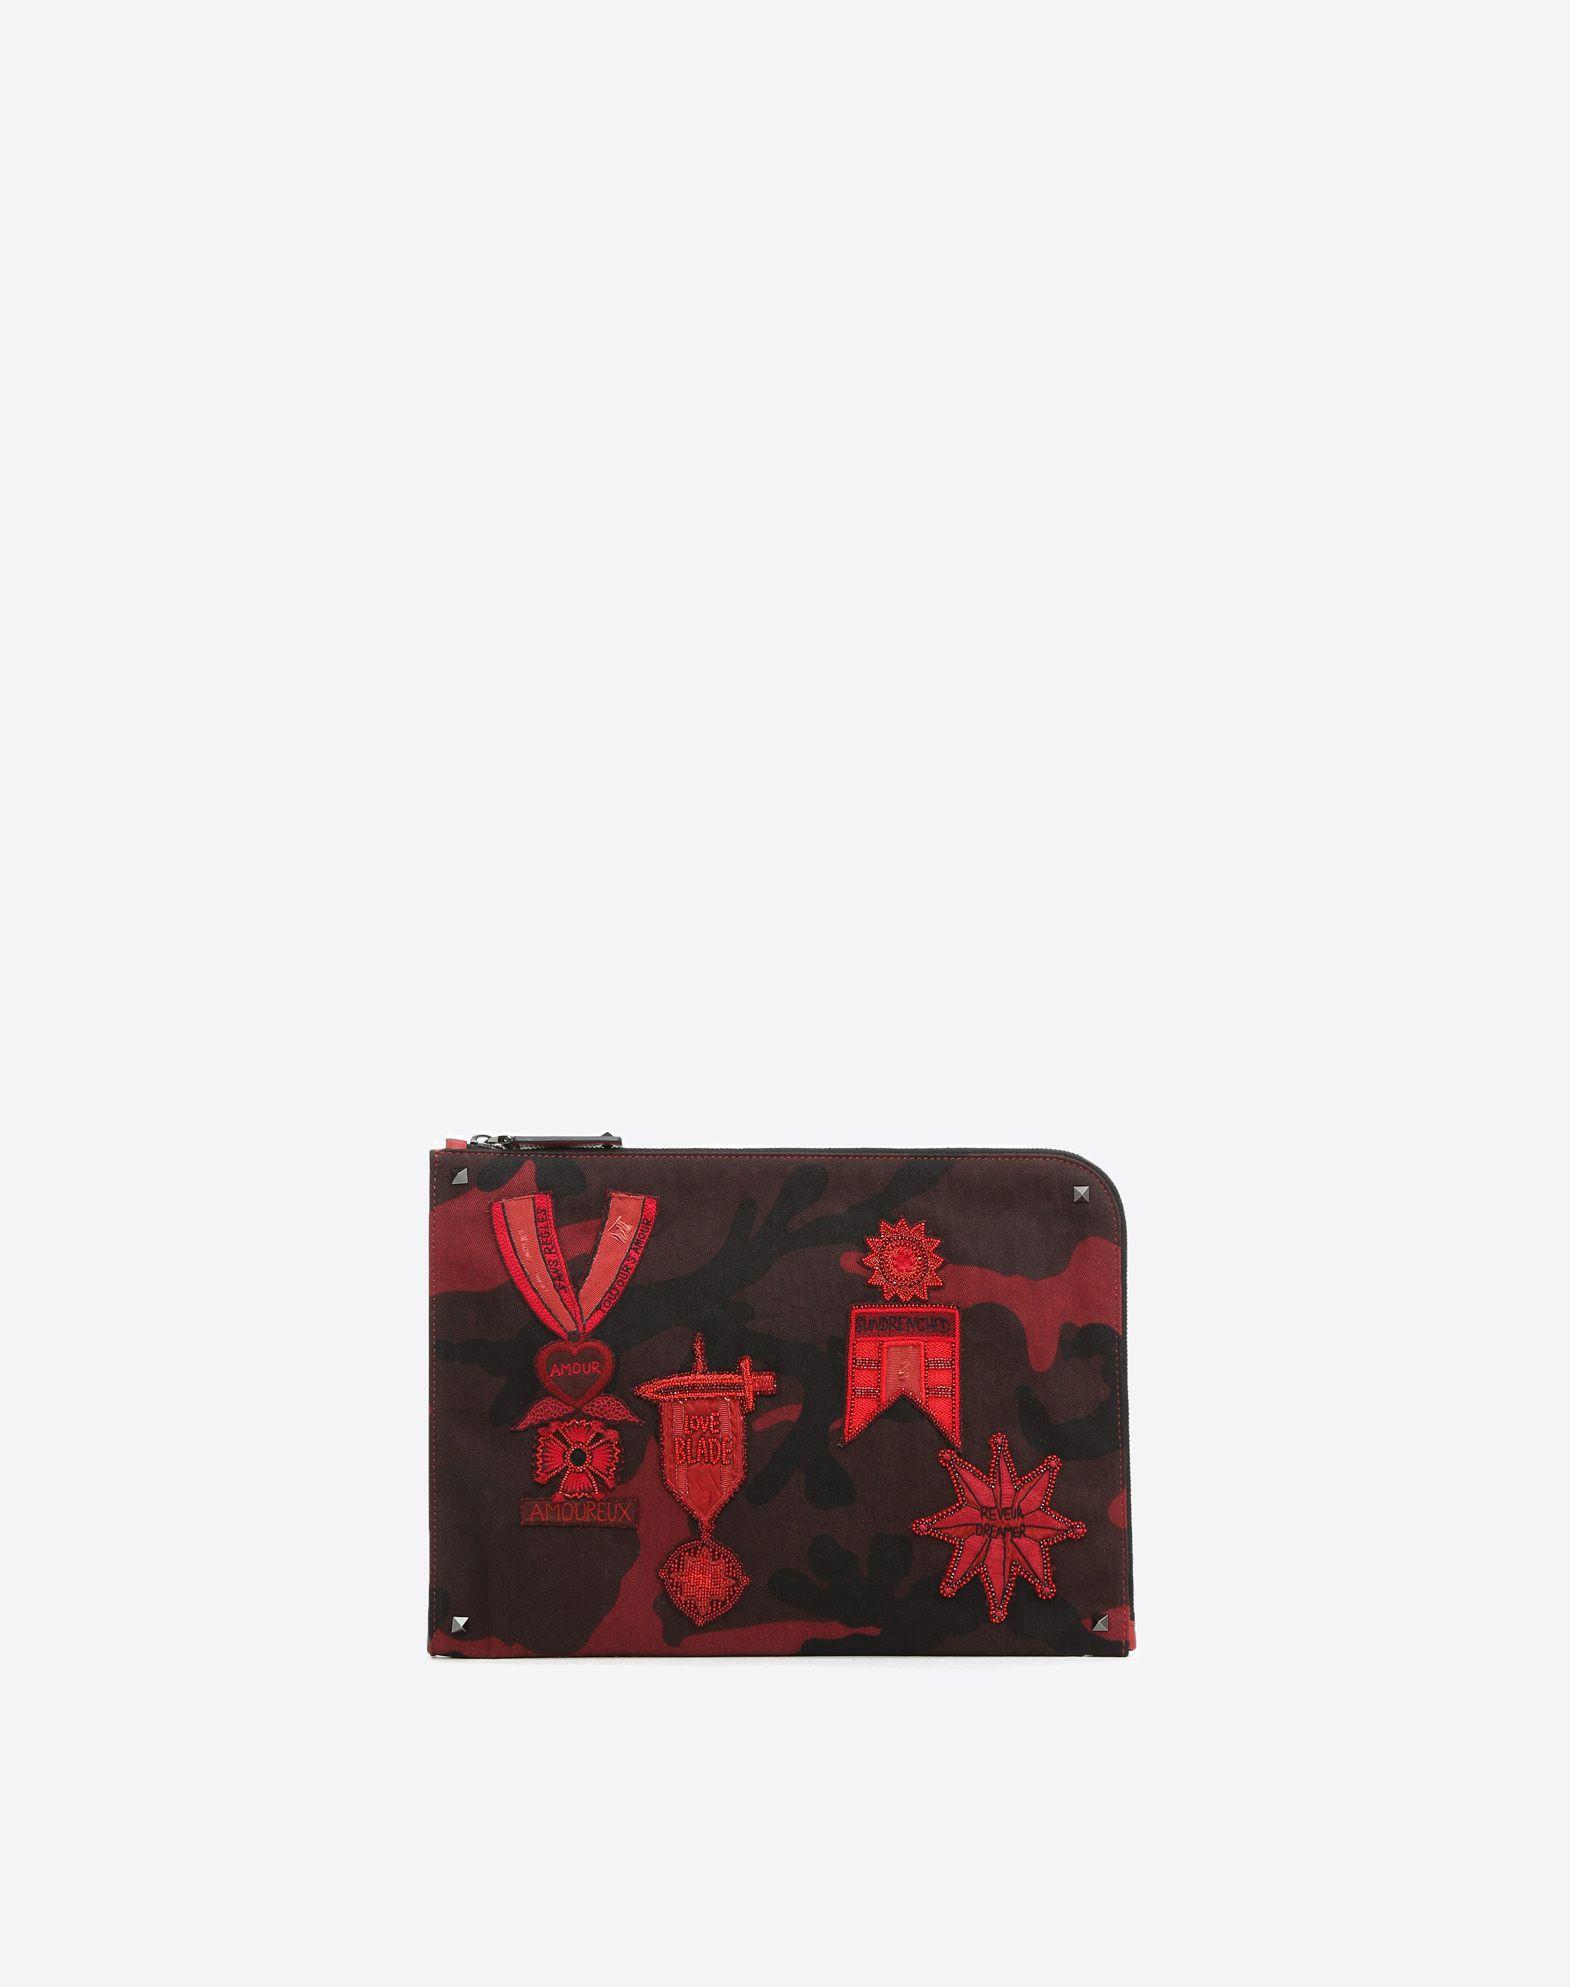 VALENTINO GARAVANI UOMO Camouflage 文件包 公文袋 U f